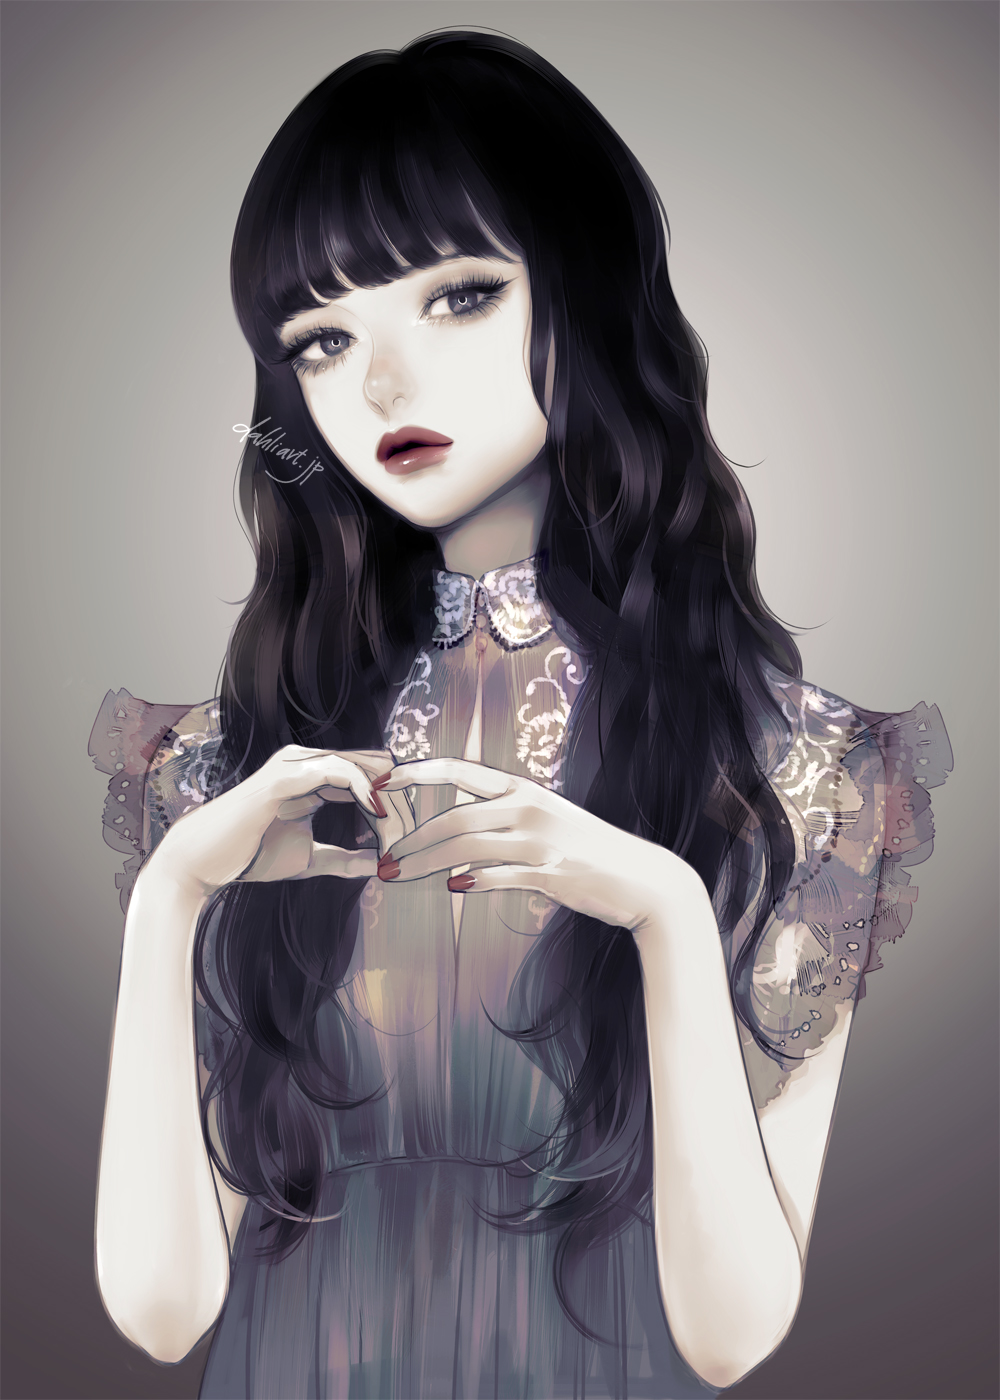 Pin by Aprillana on Girls in 2020 Anime black hair